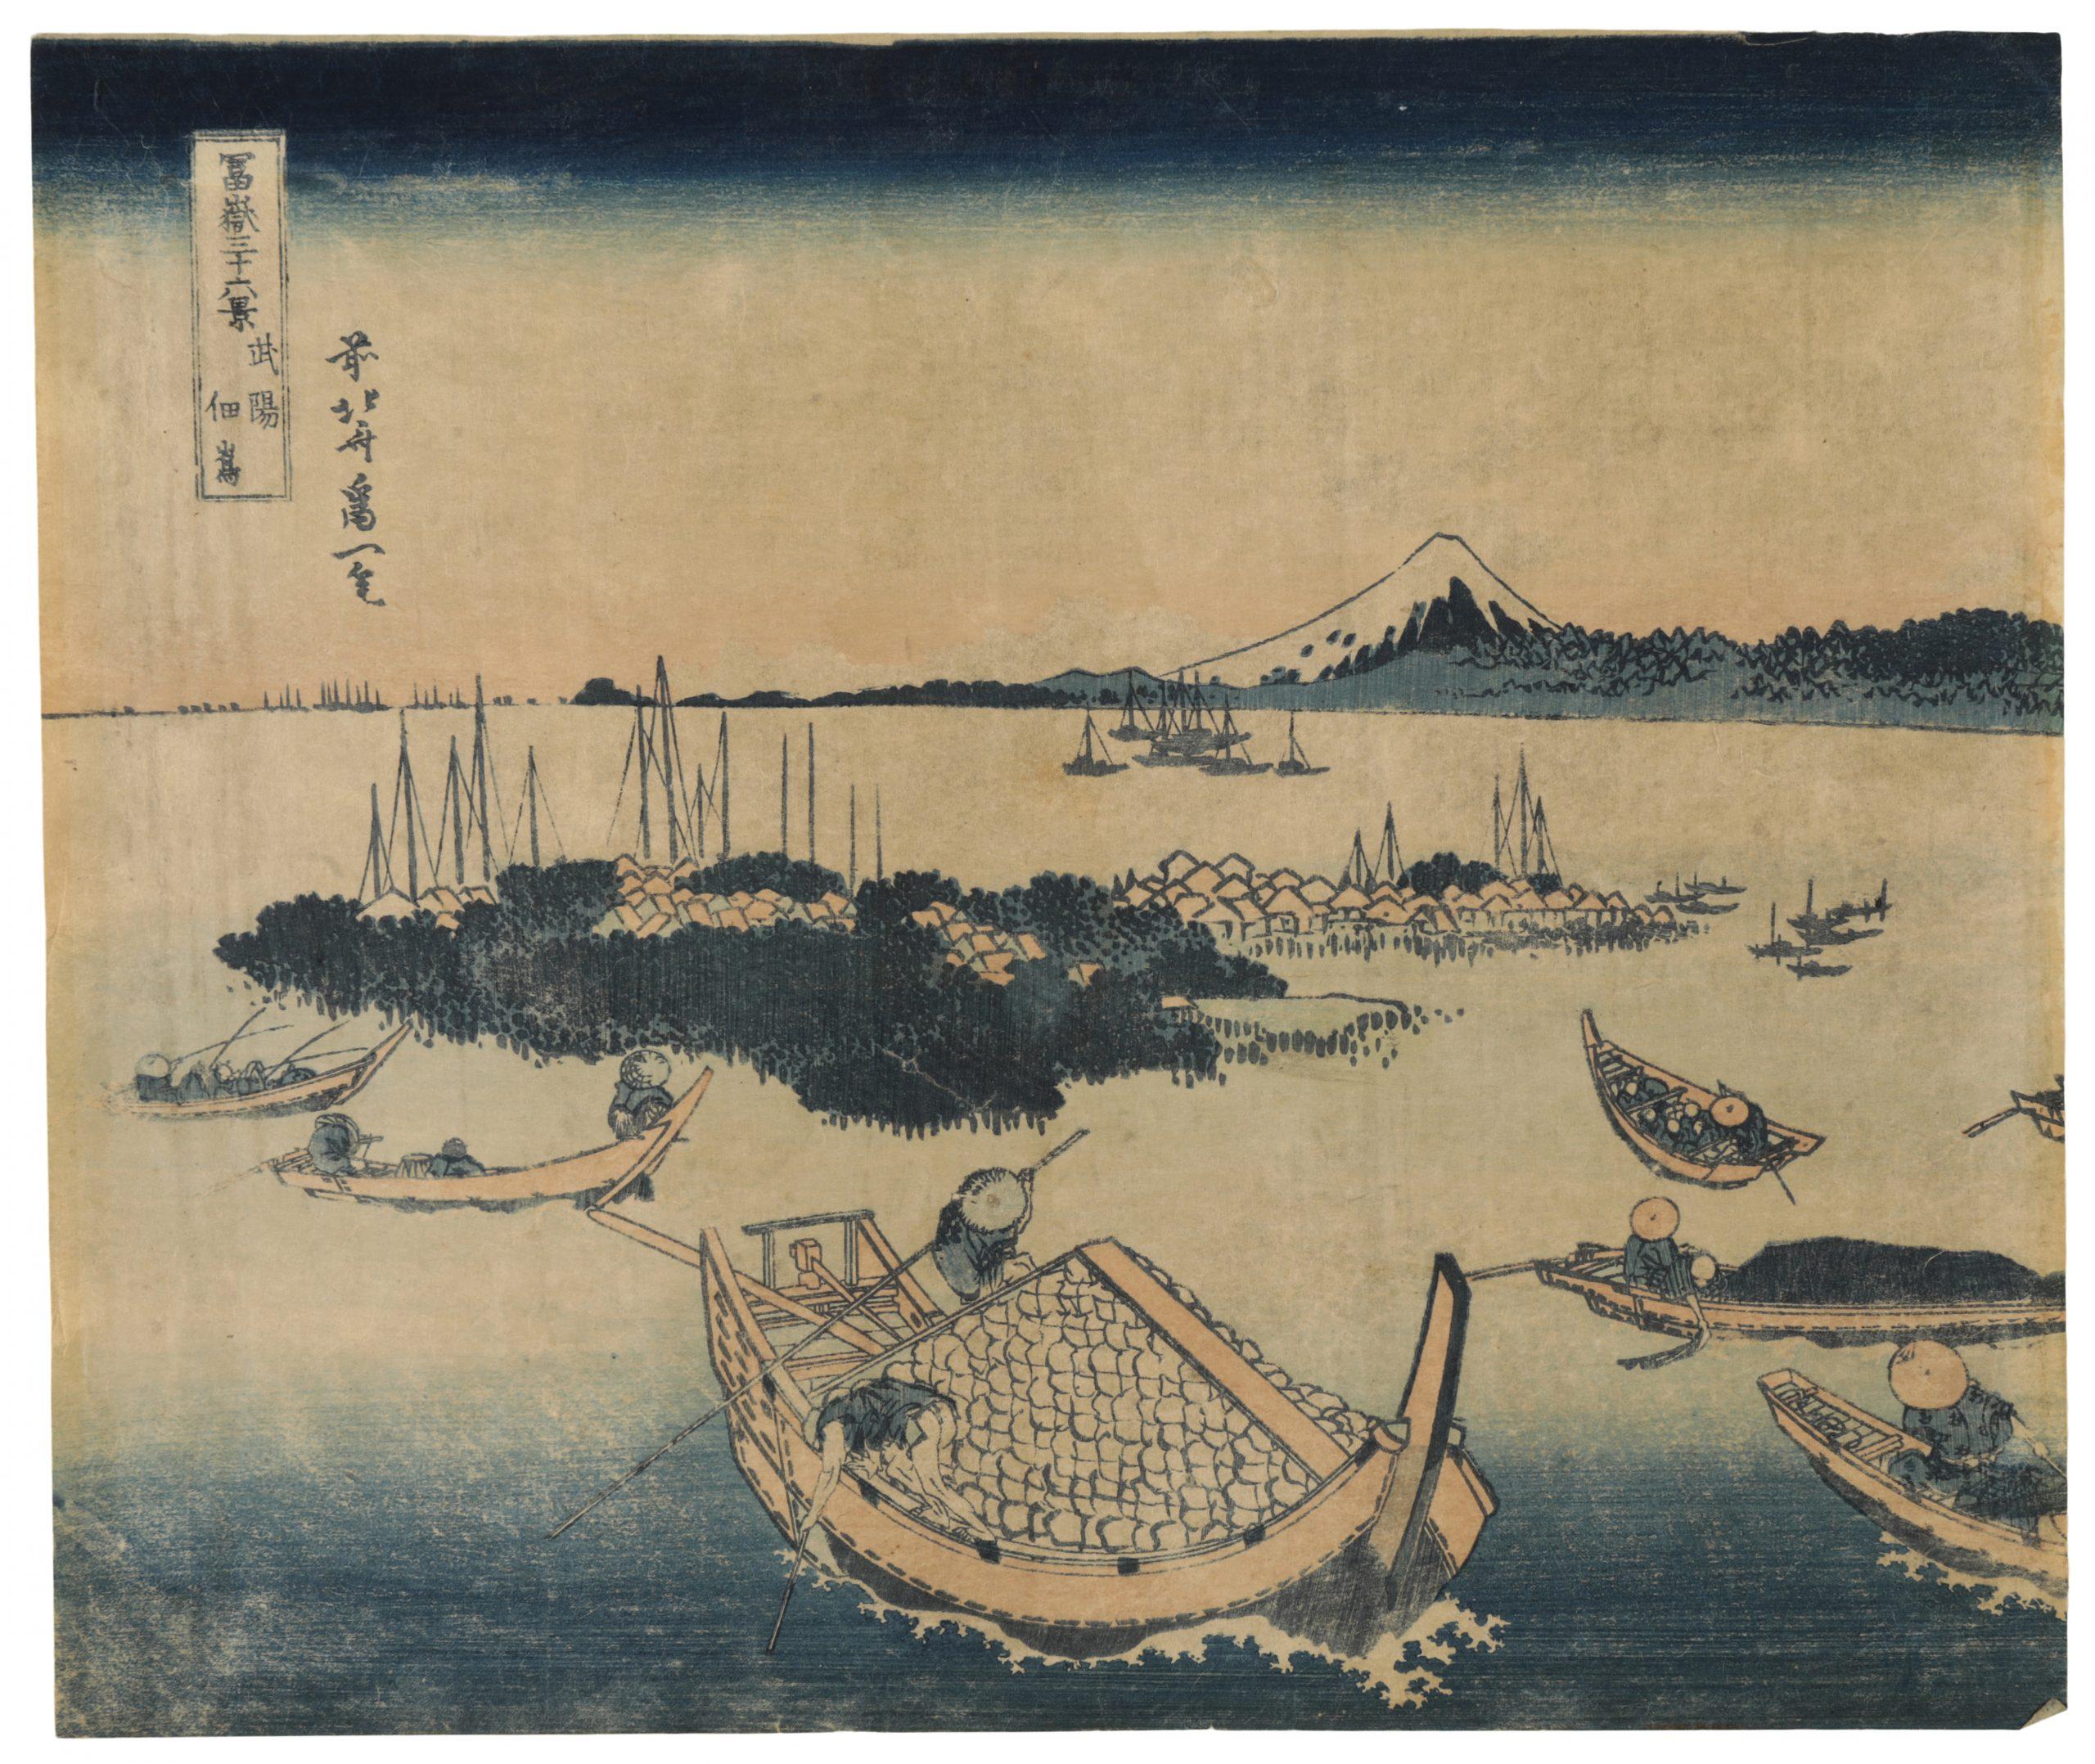 After Katsushika Hokusai (1760-1849) from the series of Thirty-Six Views of Mt. Fuji